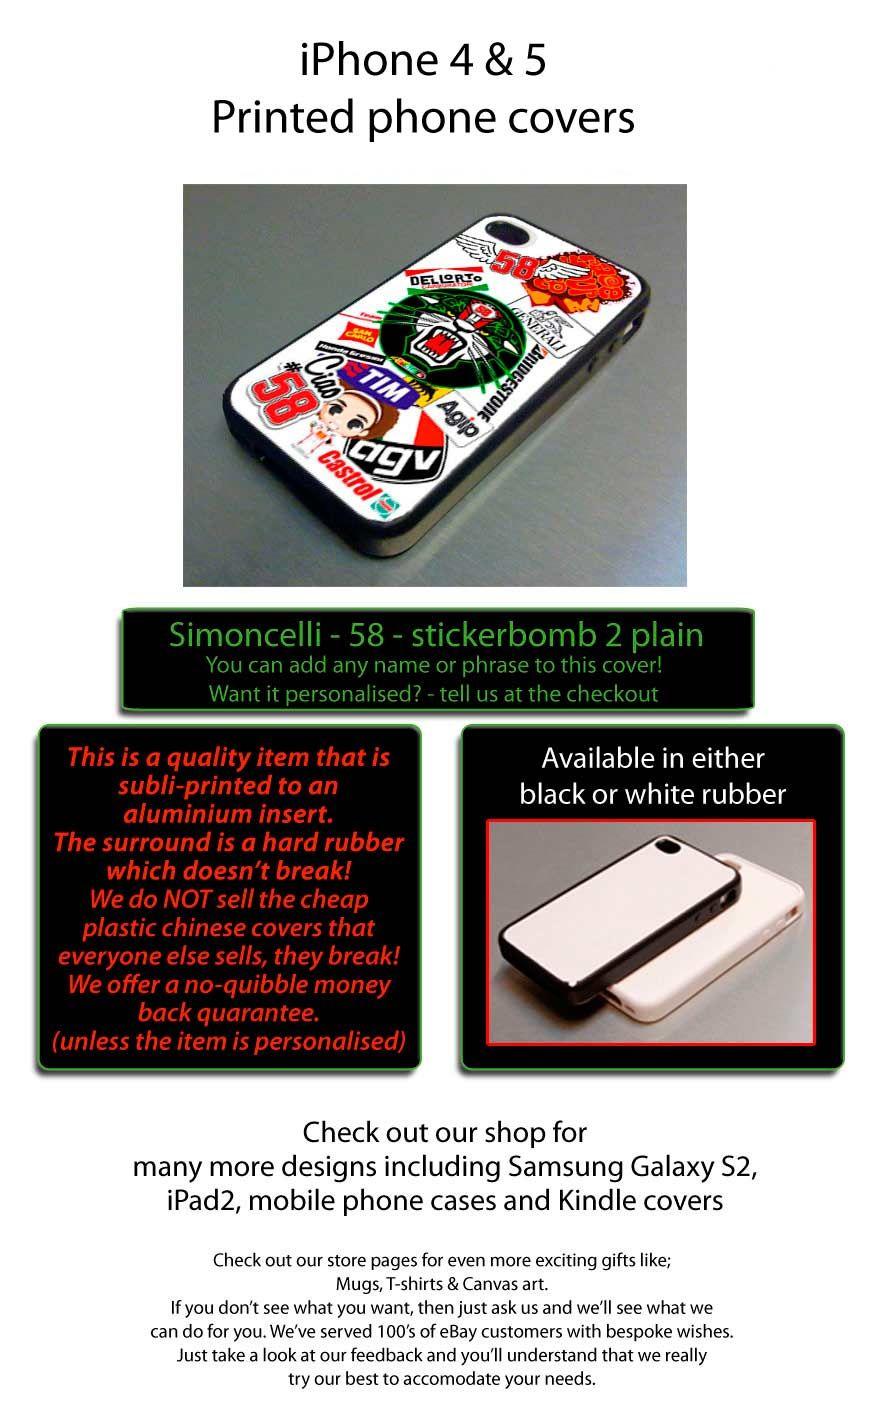 marco simoncelli plain fits iphone 4 4s cover case, 58 moto ducati